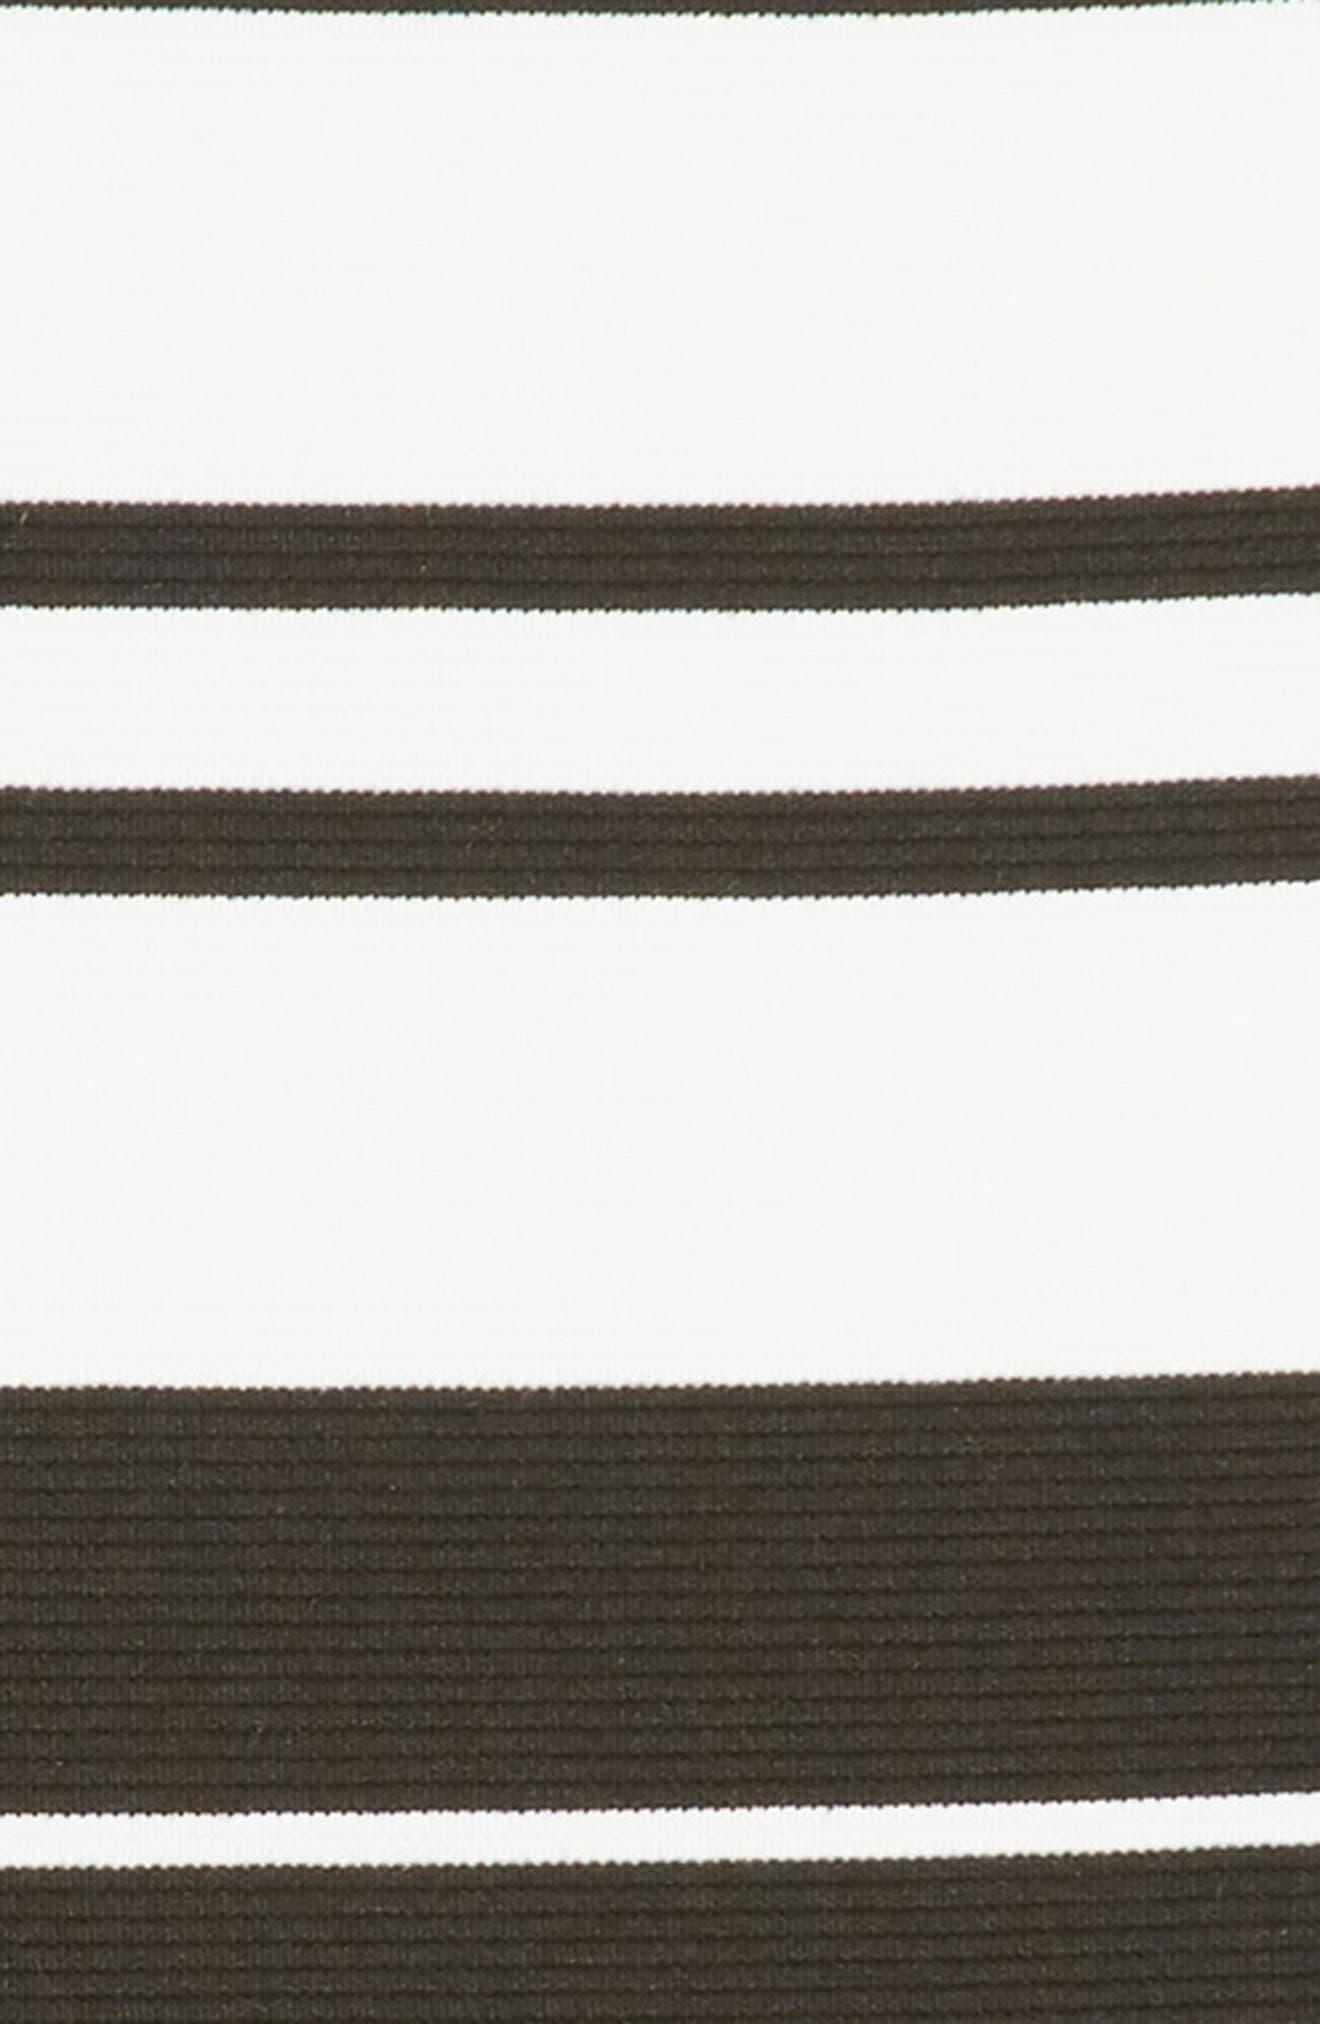 Alternate Image 3  - Elisa B Novelty Texture Knit Dress (Big Girls)